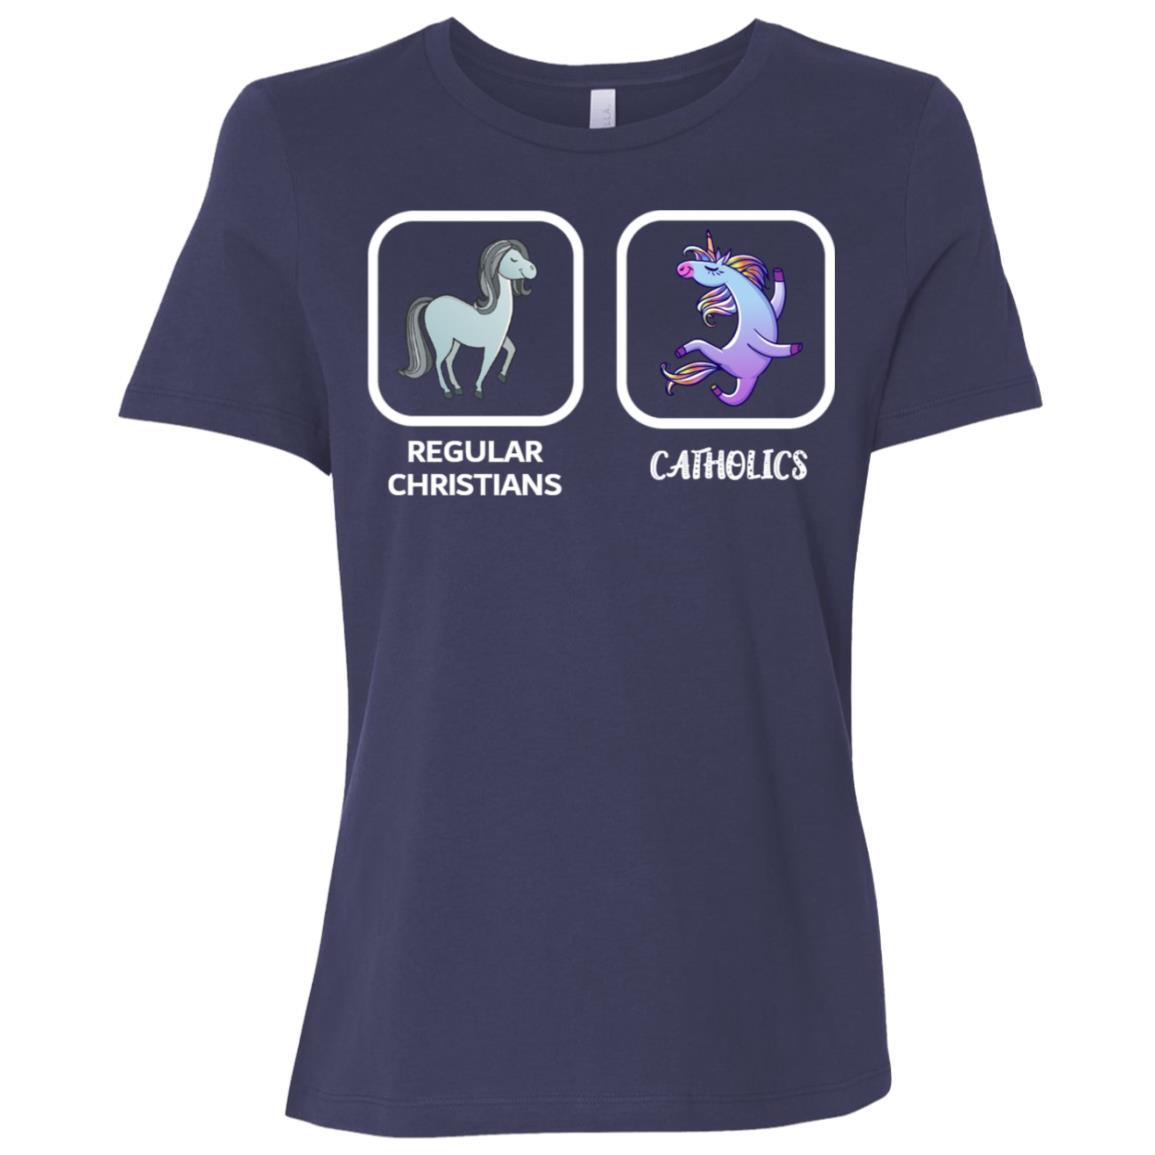 Regular Christians Catholics Funny Christian Catholic Ls Tee Women Short Sleeve T-Shirt